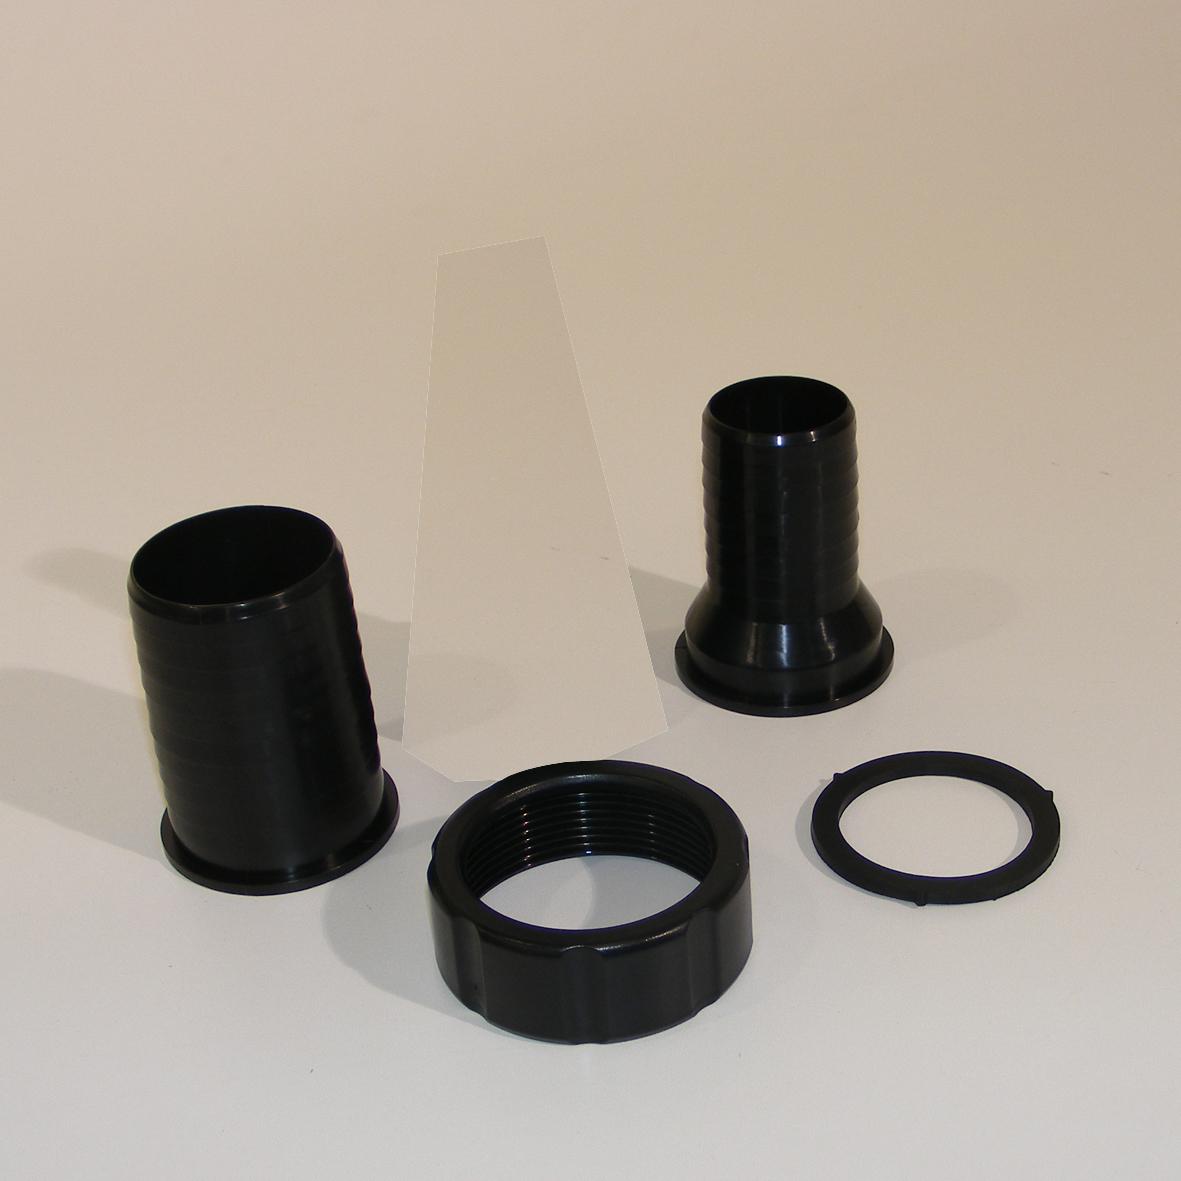 oase anschluss kit aquamax expert teichundgarten24. Black Bedroom Furniture Sets. Home Design Ideas